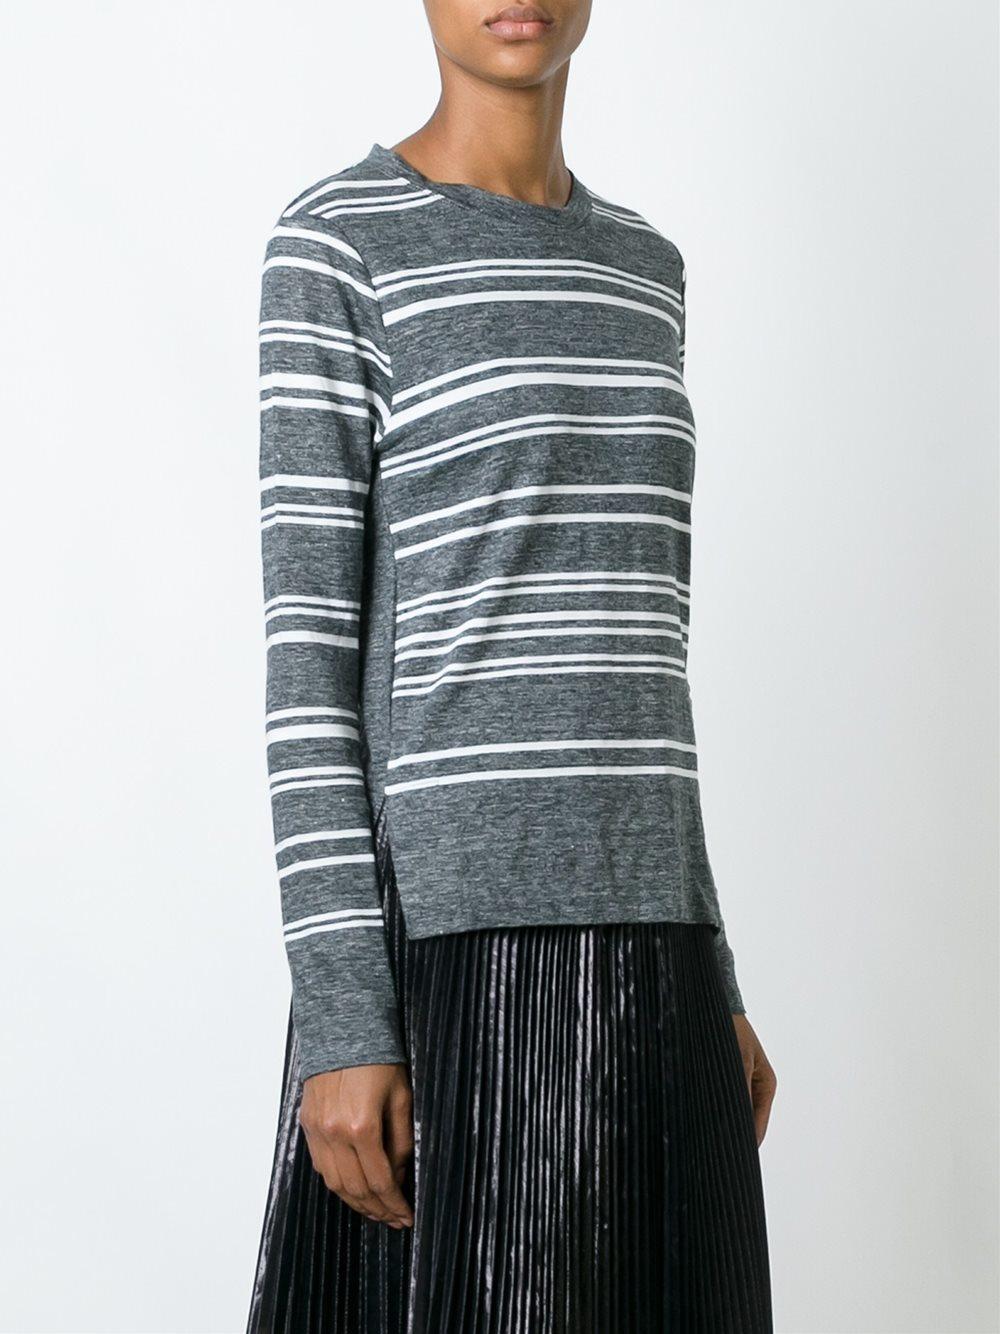 Lyst dkny striped t shirt in gray Grey striped t shirt